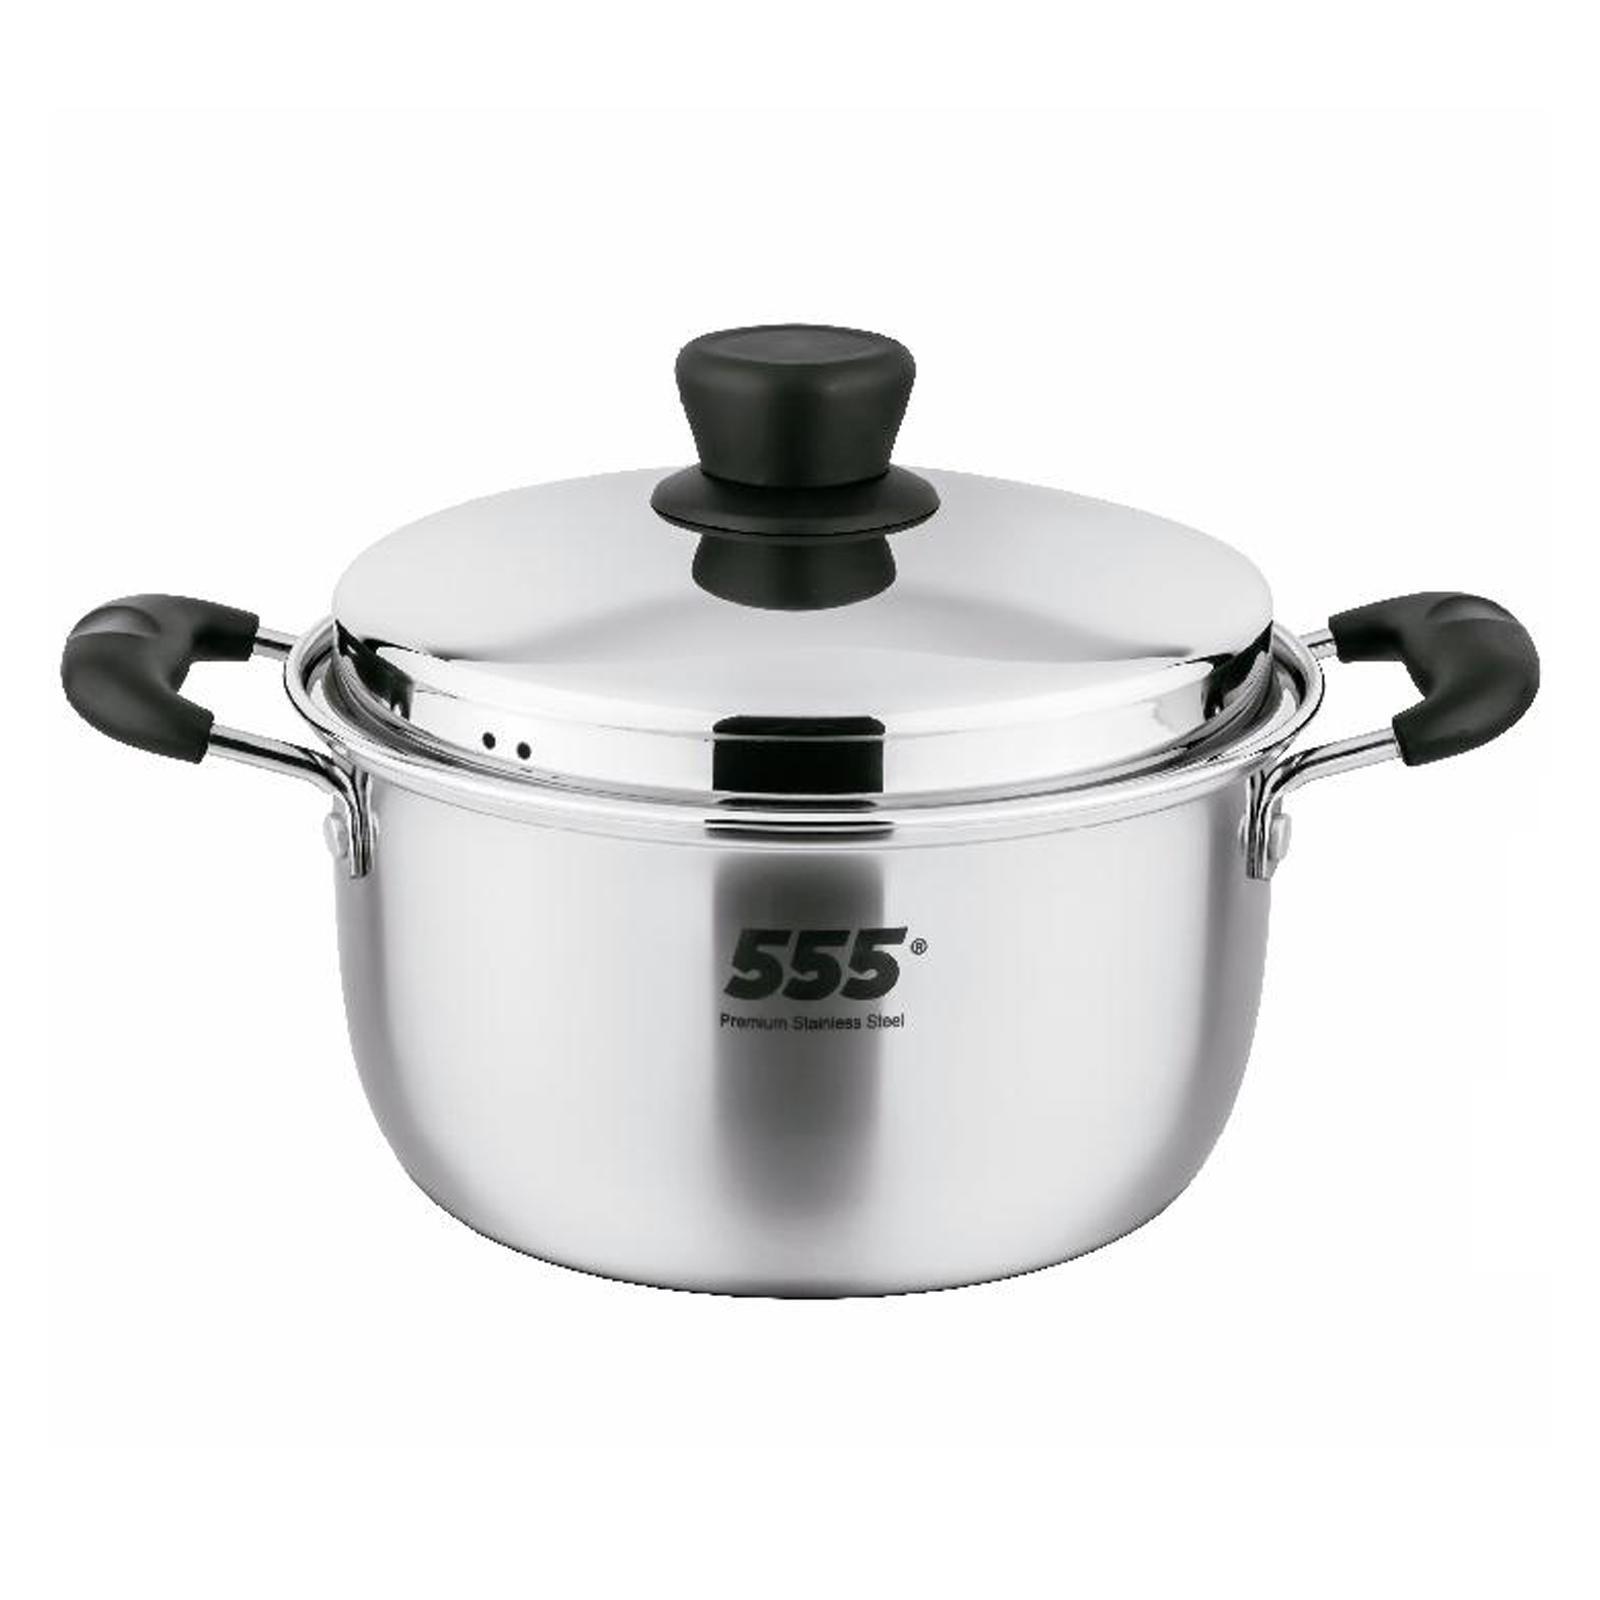 555 Premium Stainless Steel Saucepot 3.2L